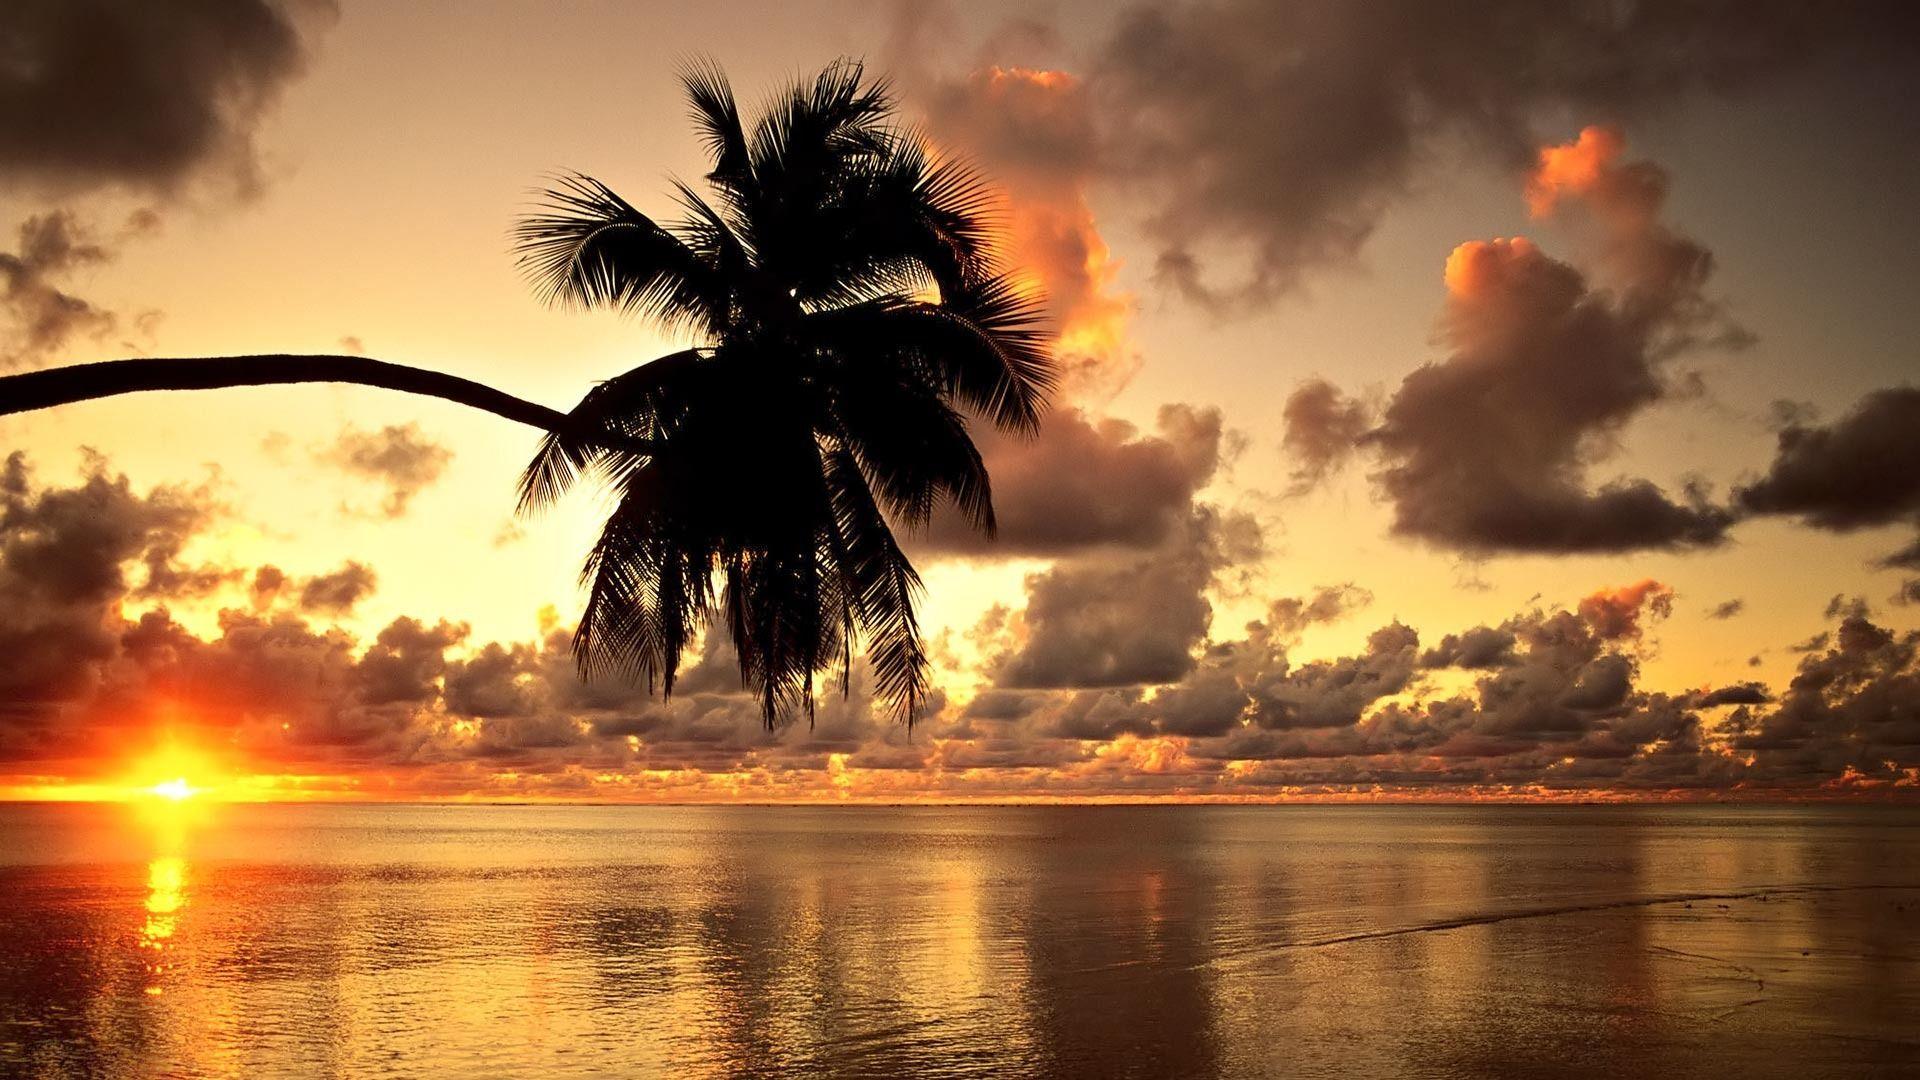 Hawaiian Sunset Hd Beach Wallpapers P Hd Pic